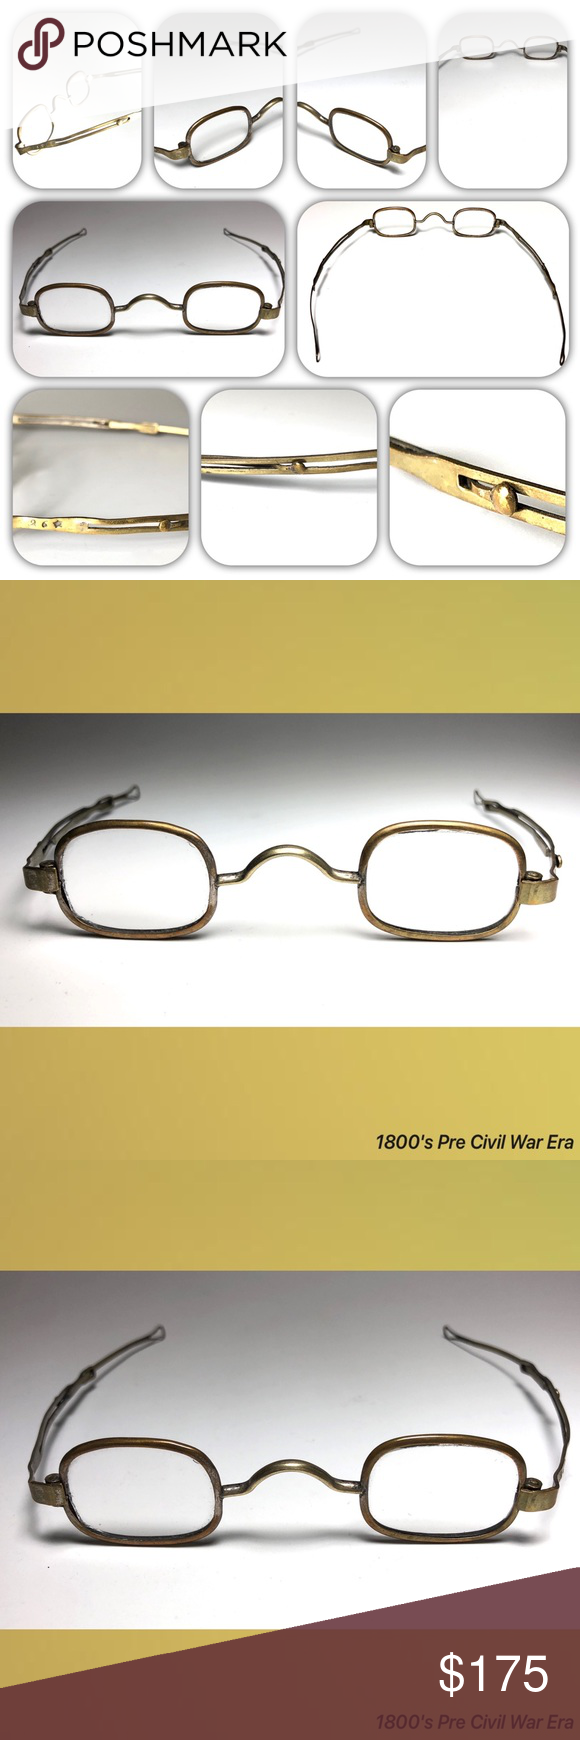 787999a95016 1800 s Pre Civil War Era Antique Reading Glasses 1800 s Pre Civil War Era  Antique Reading Glasses